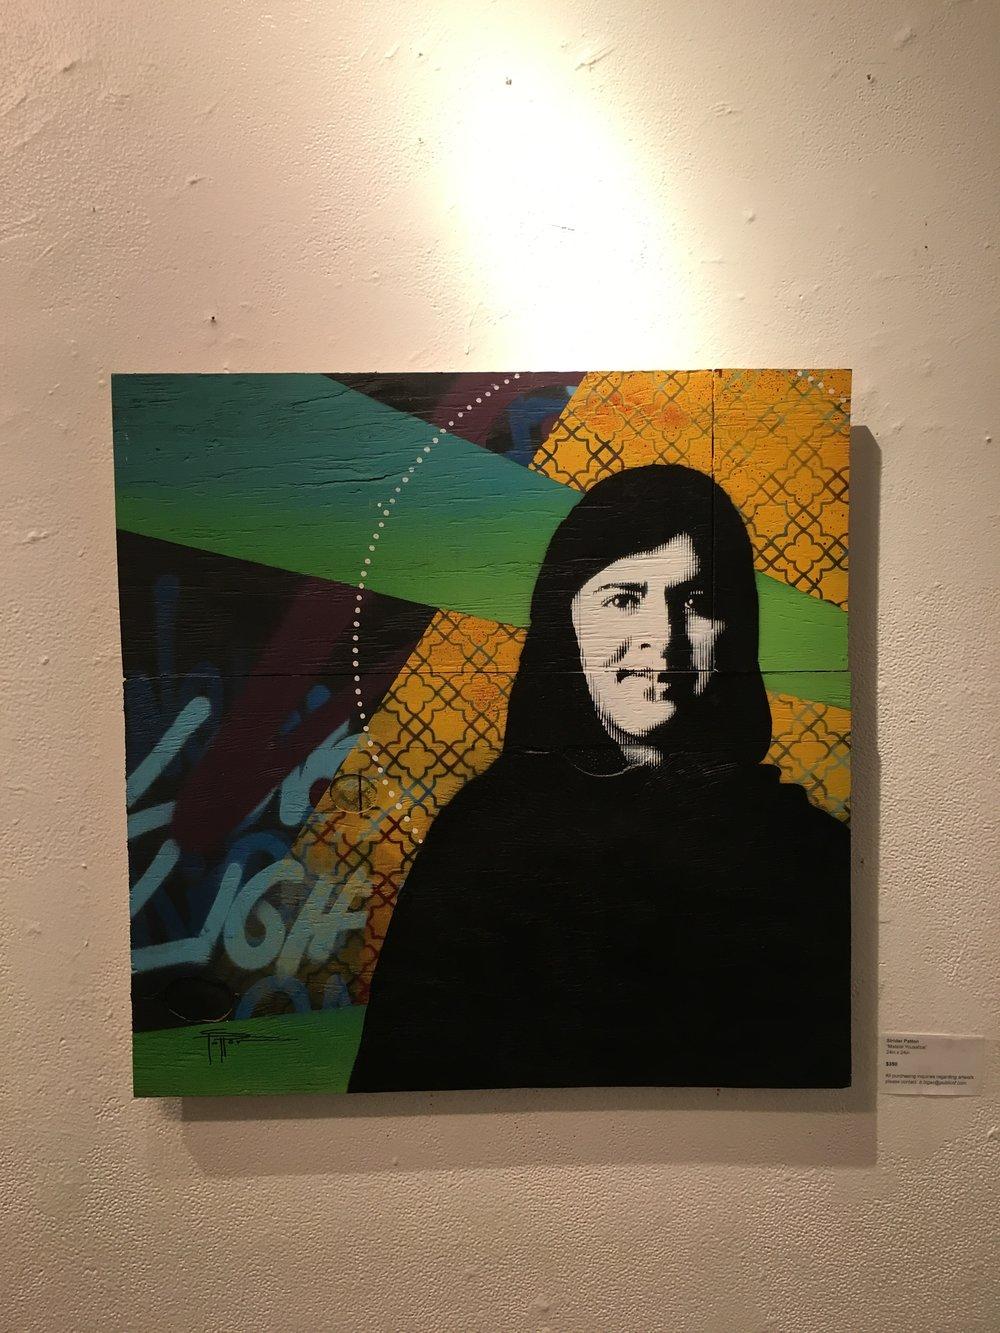 Strider Patton - Malala Yousafzi - Idols show - San Francisco, CA 2016